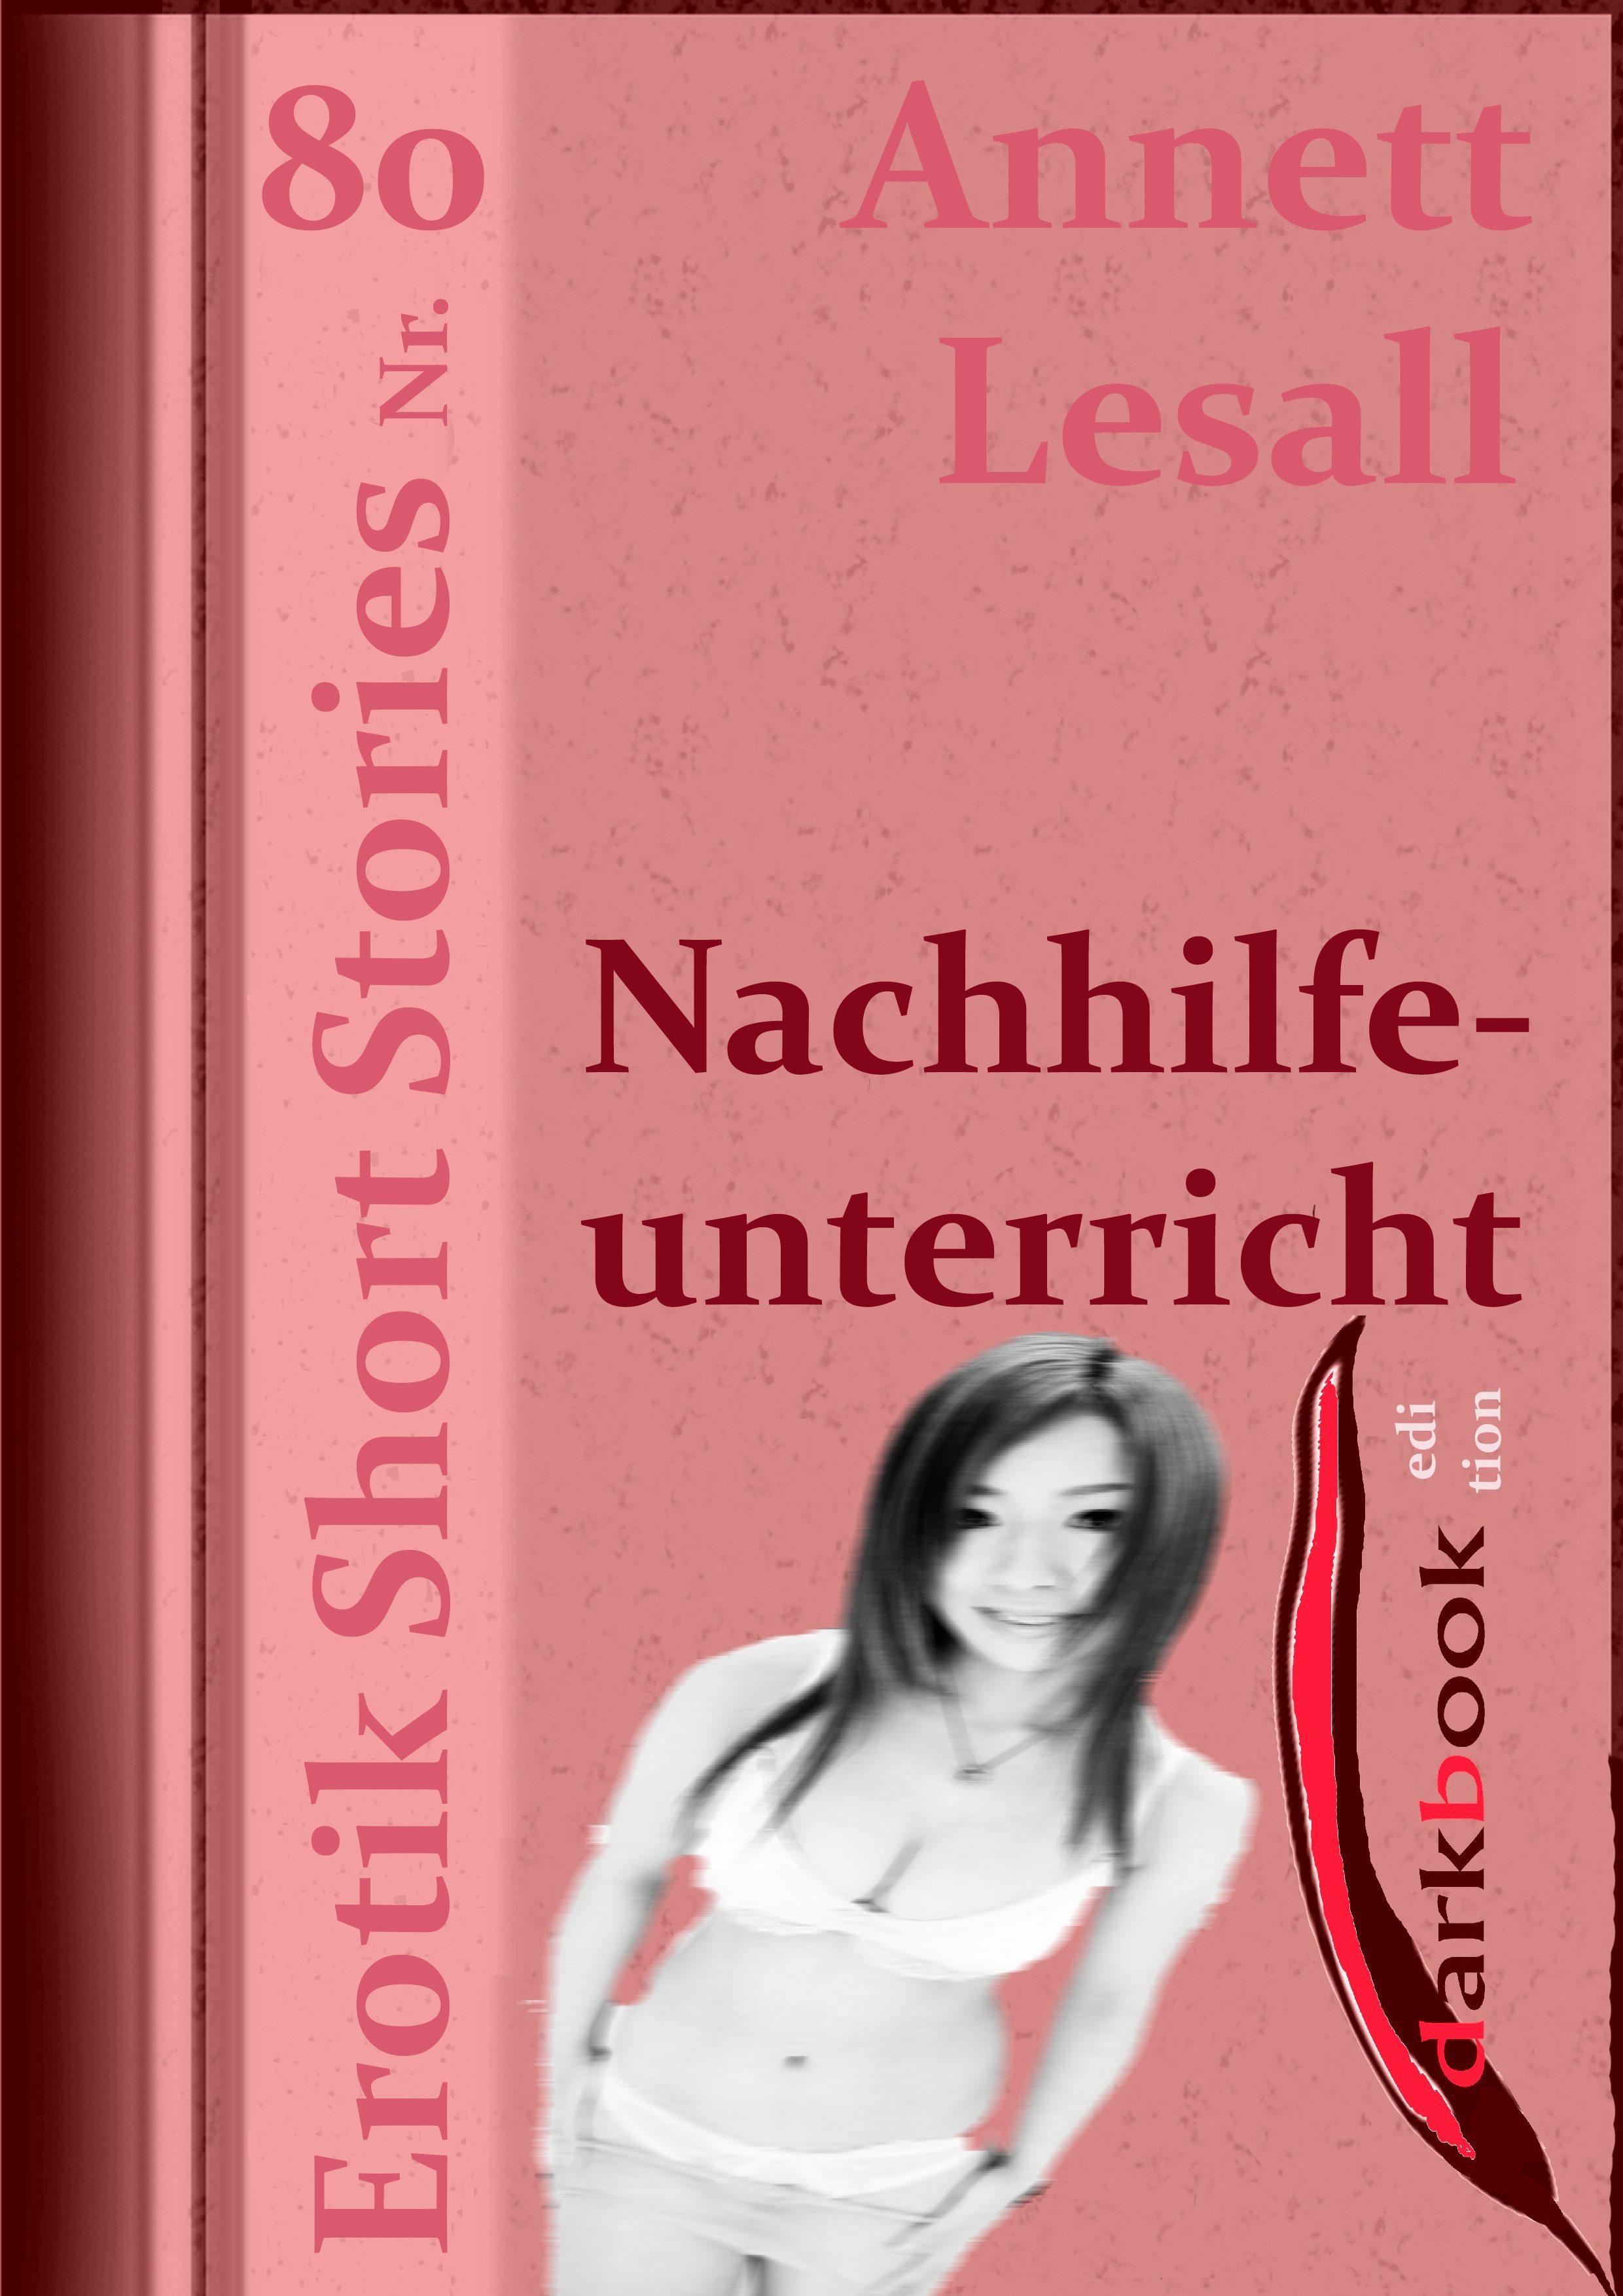 Nachhilfeunterricht   por Annett Lesall epub